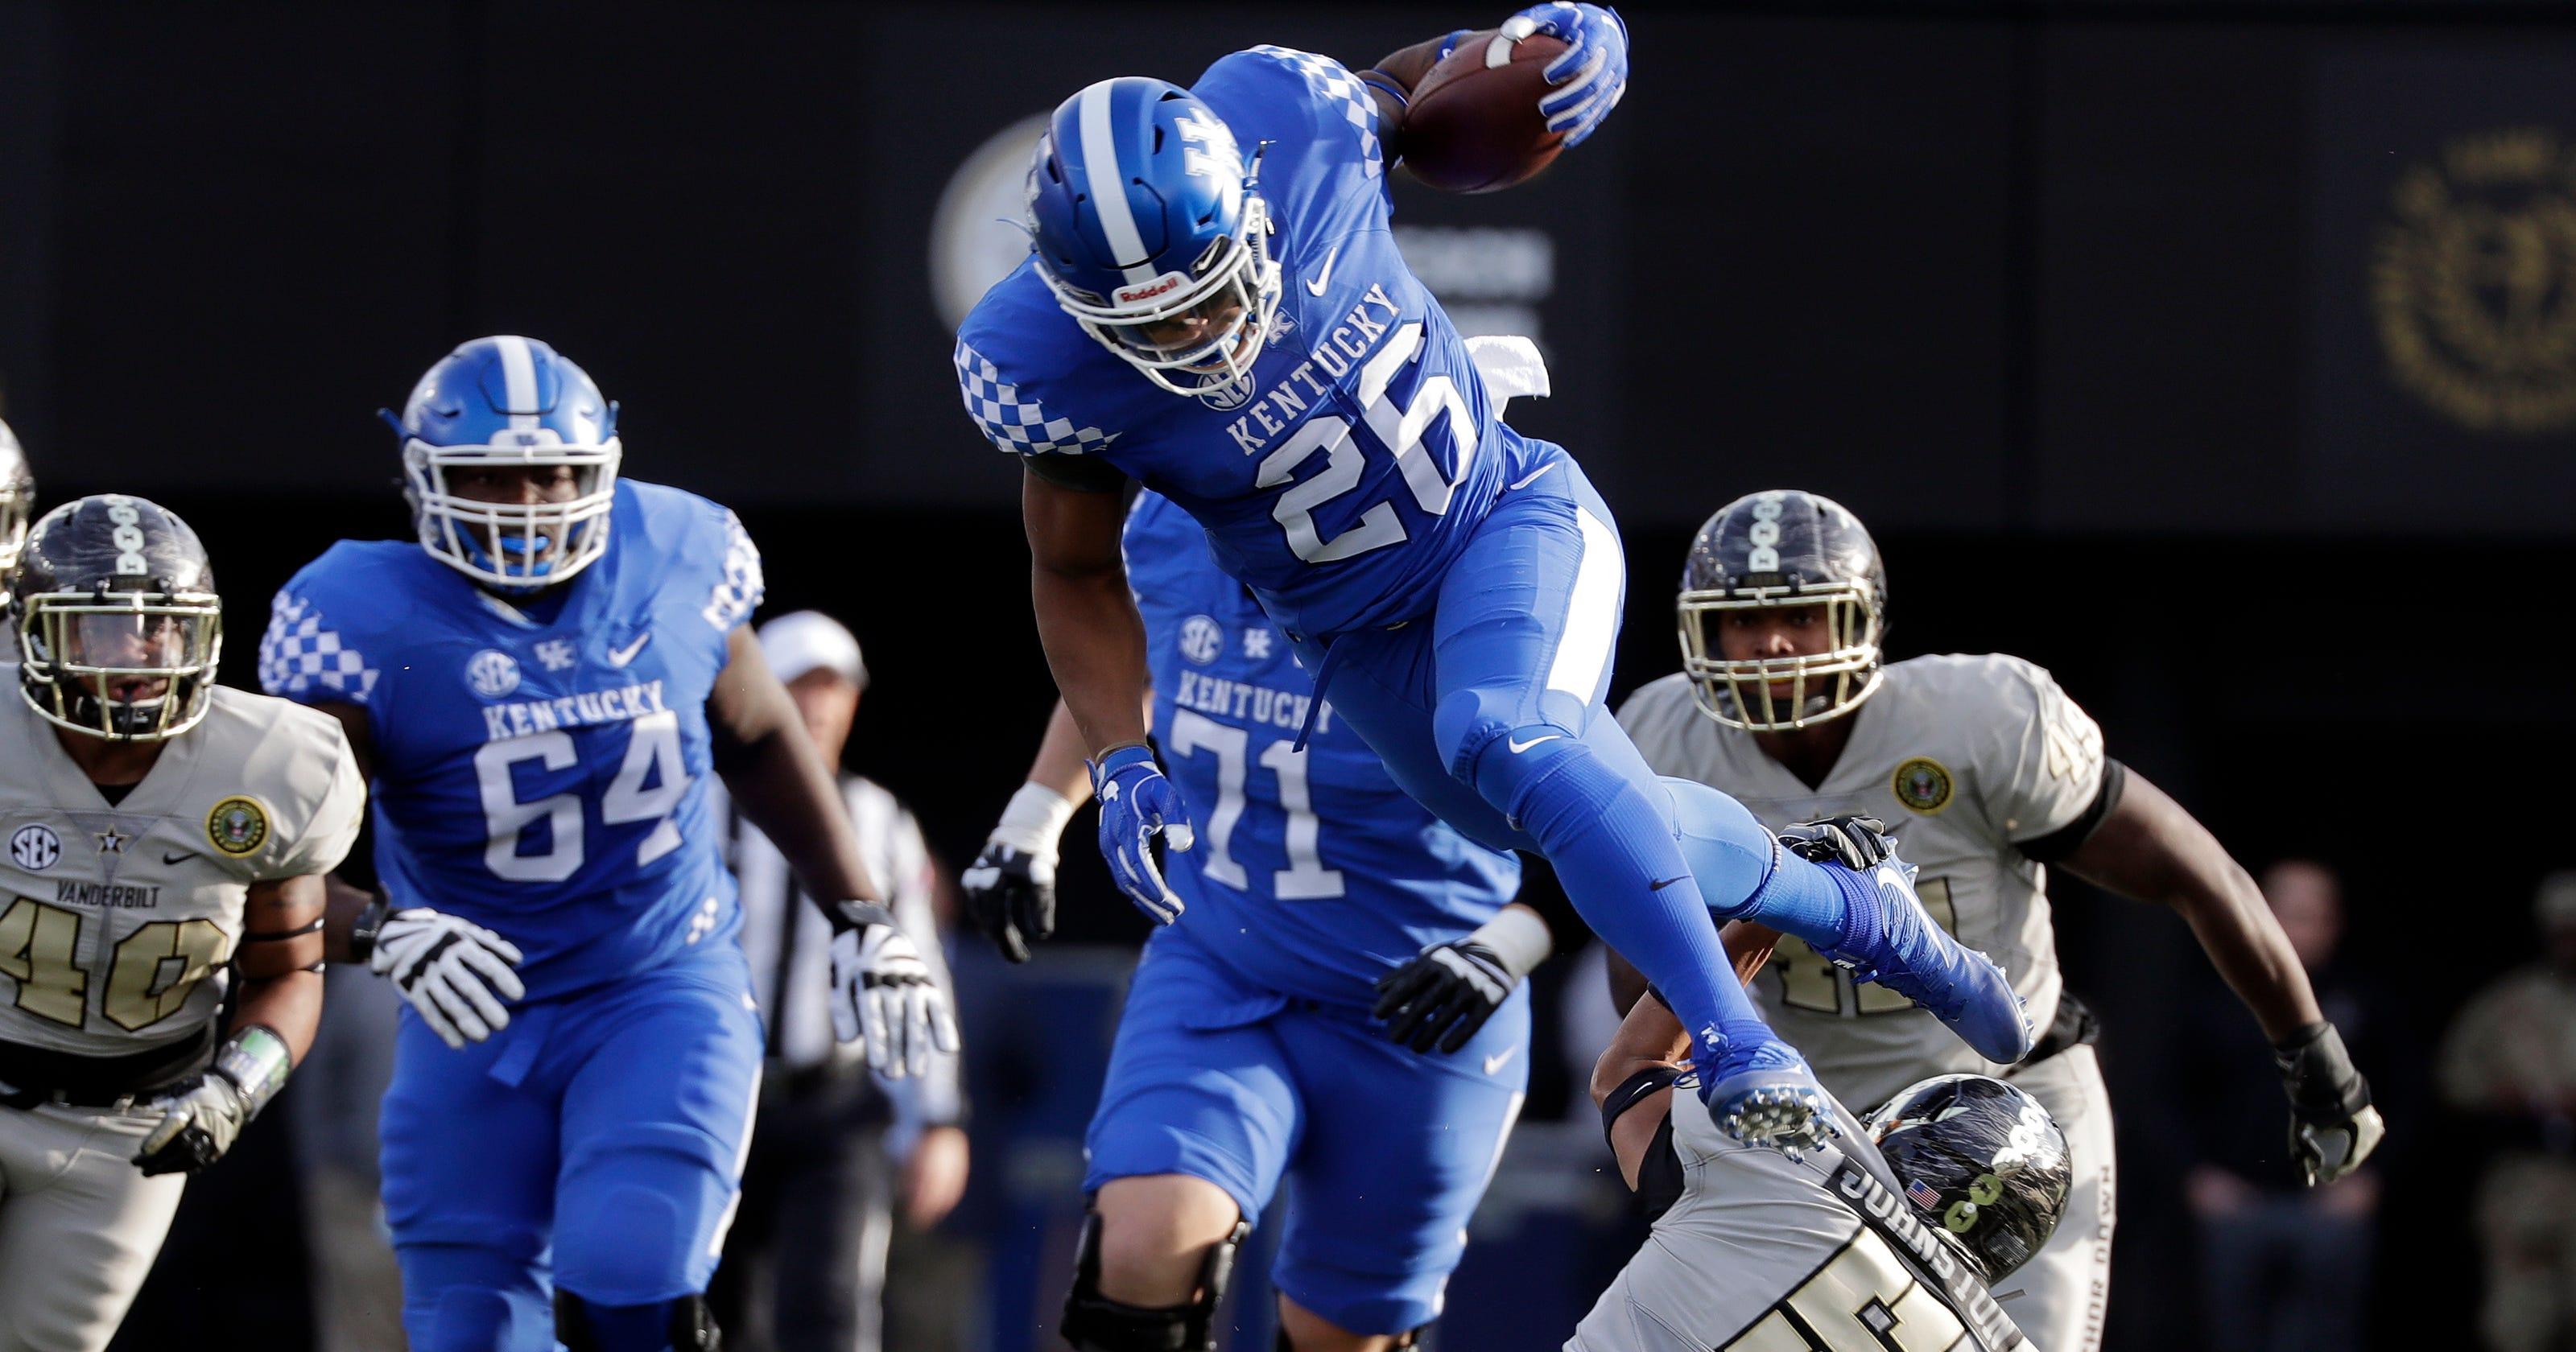 Sophomore Benny Snell sets Kentucky football career rushing touchdowns  record vs. Vanderbilt e73b8f7bd